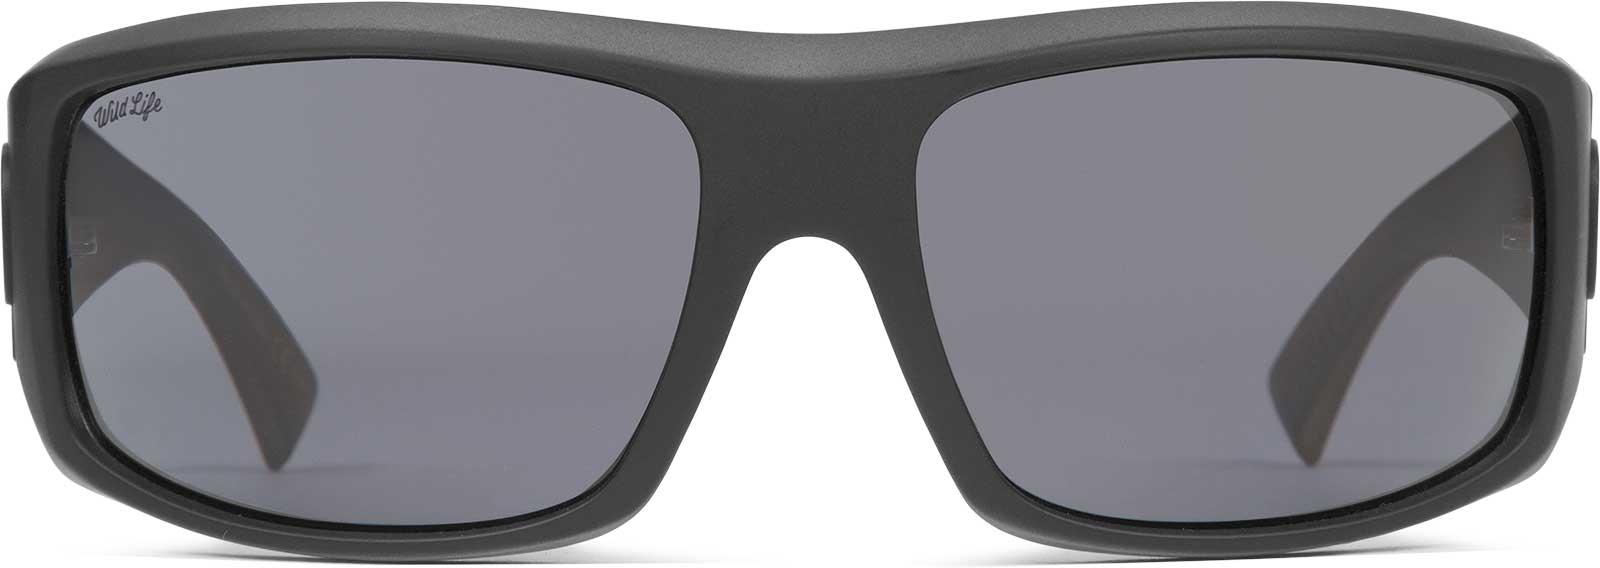 ef91942338 ... Von Zipper Clutch Wildlife Polarized Sunglasses Mens eBay